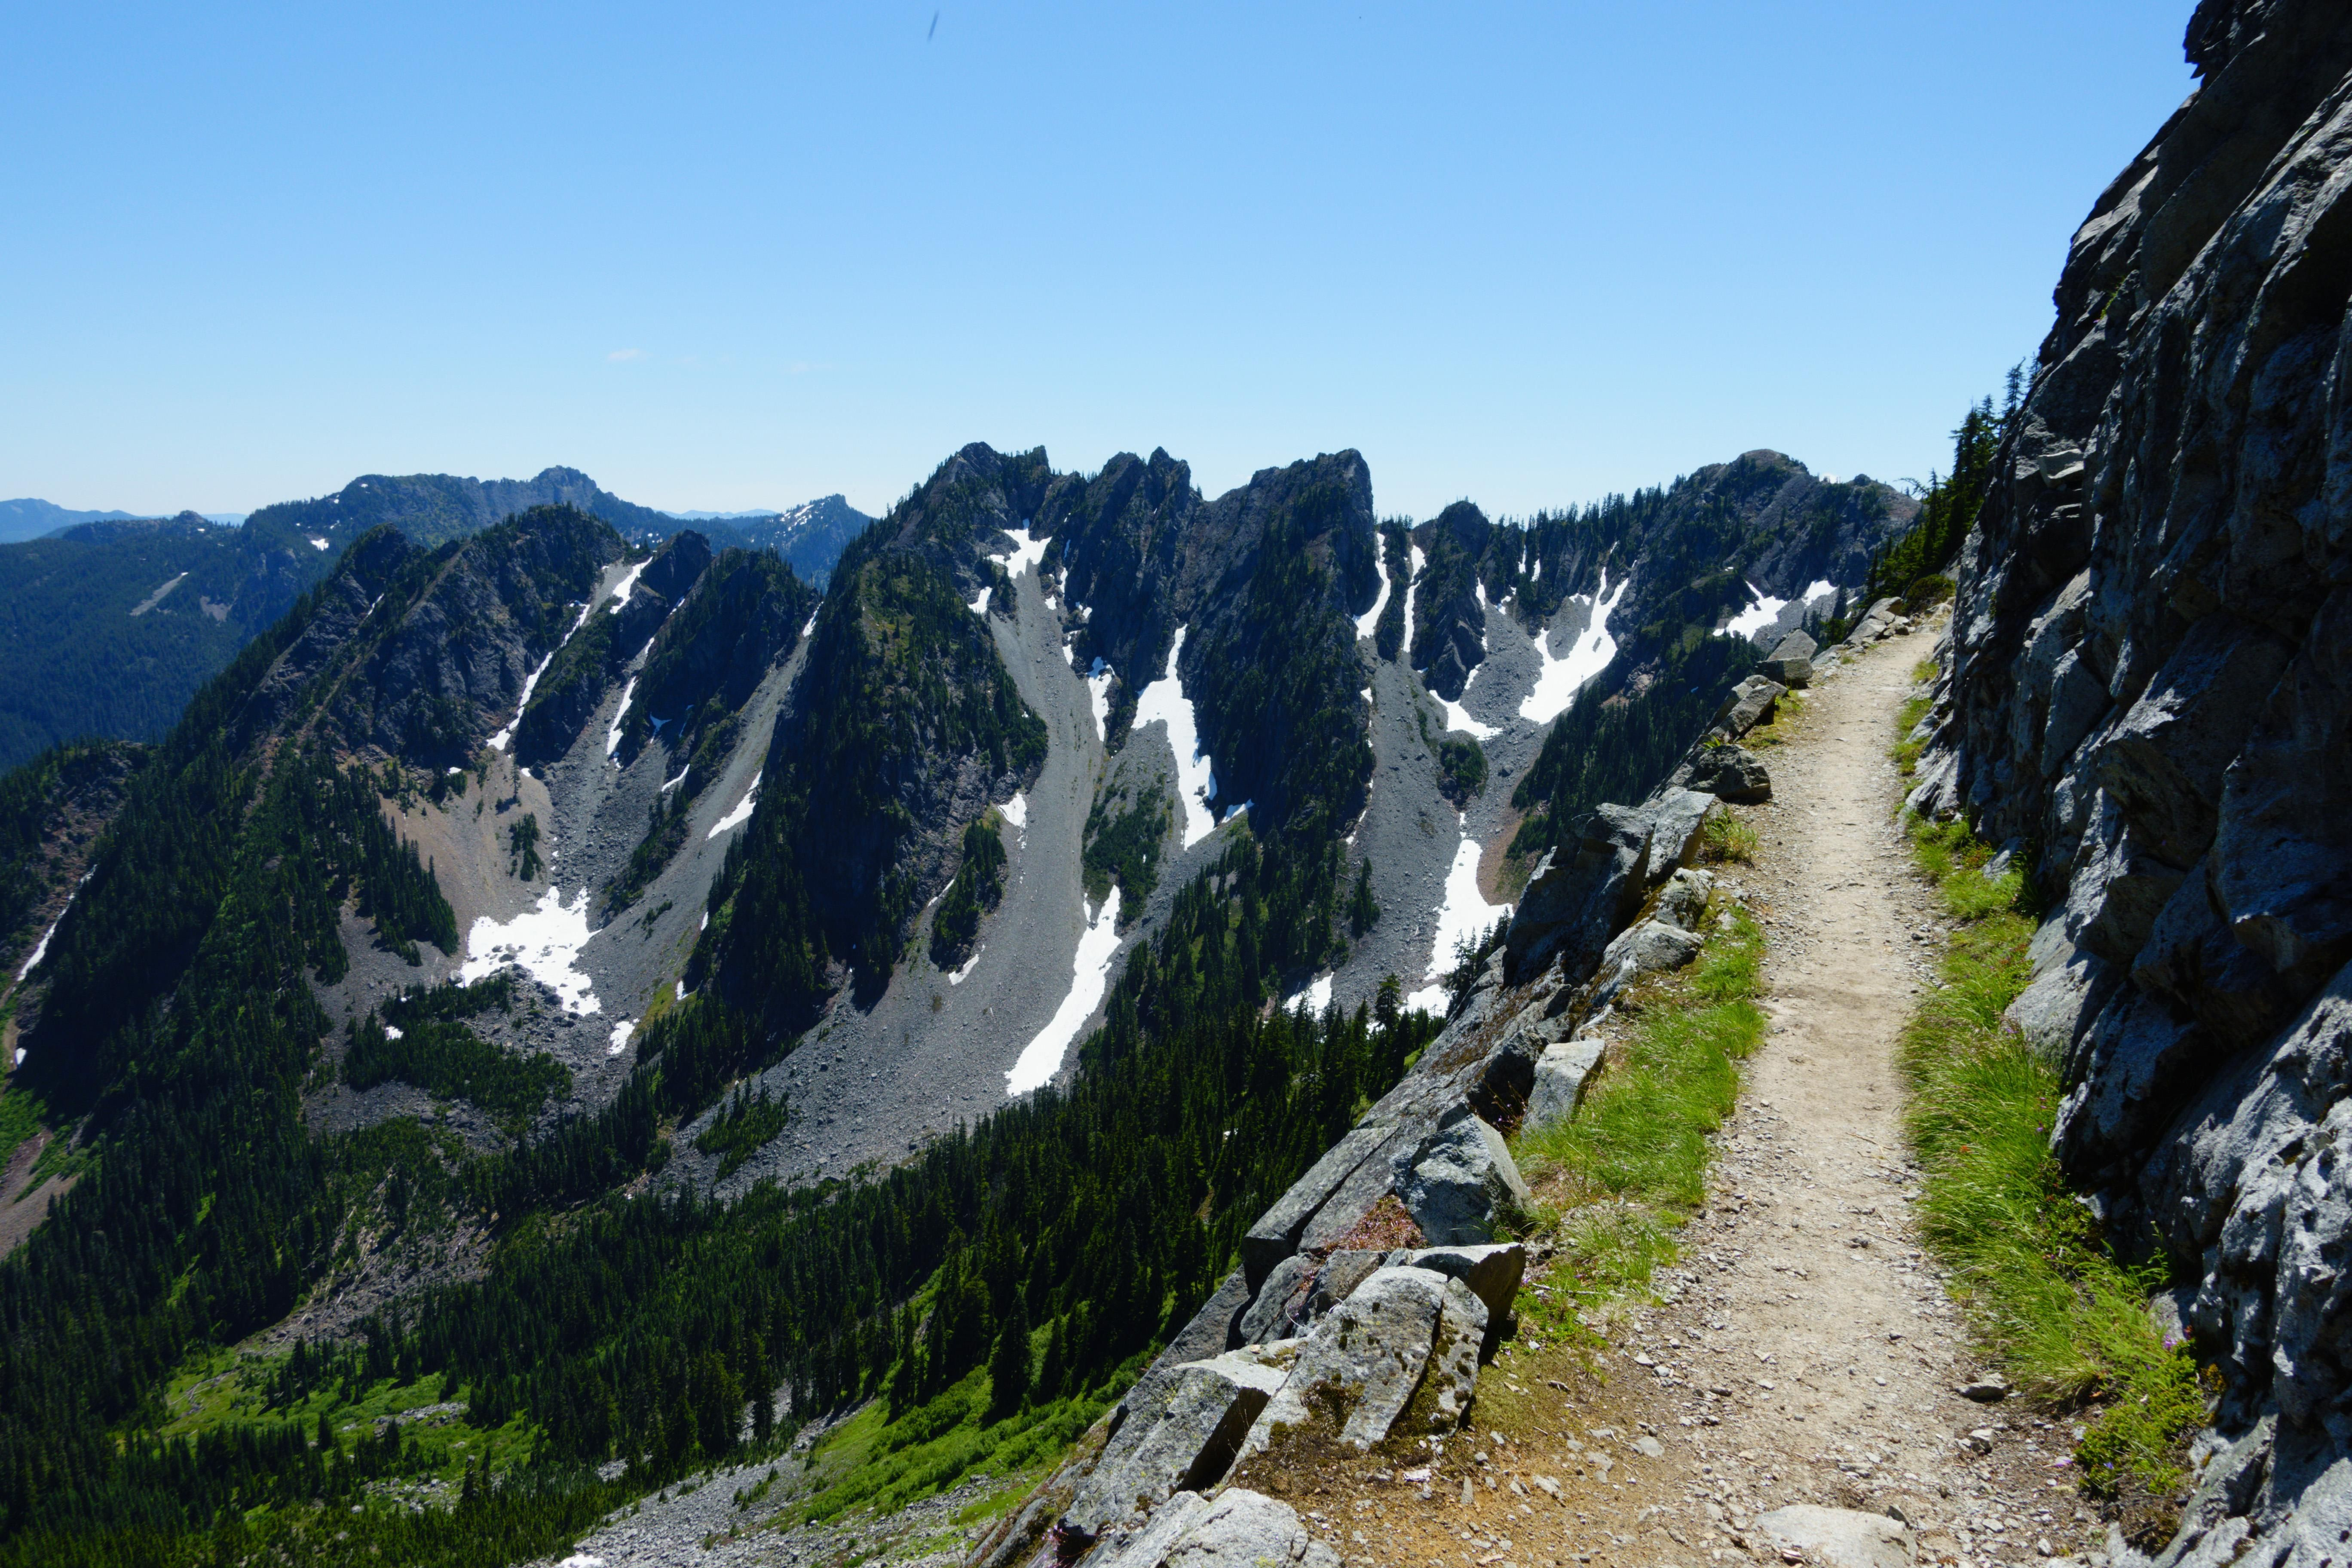 Kendall katwalk alpine lakes wilderness wa oc my blog